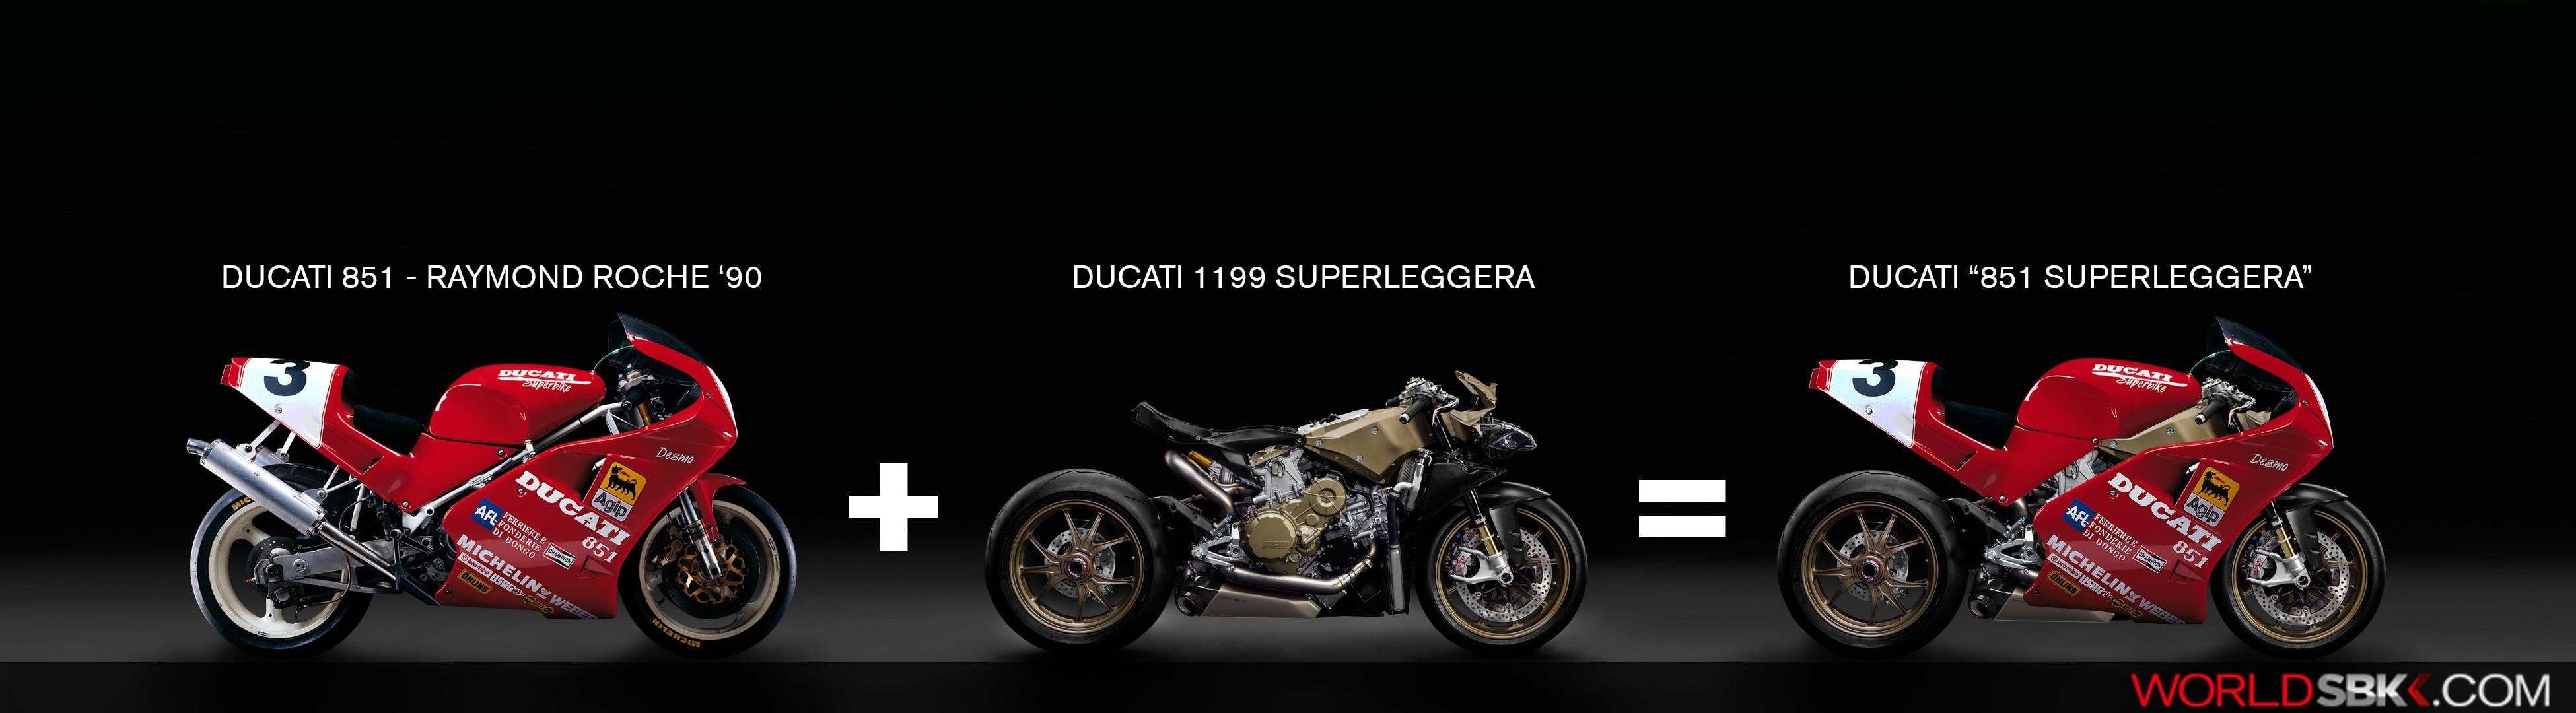 ducati 1199/1299 Panigale ( Topic N.4 ) - Page 2 Ducati_851_mas_superleggera